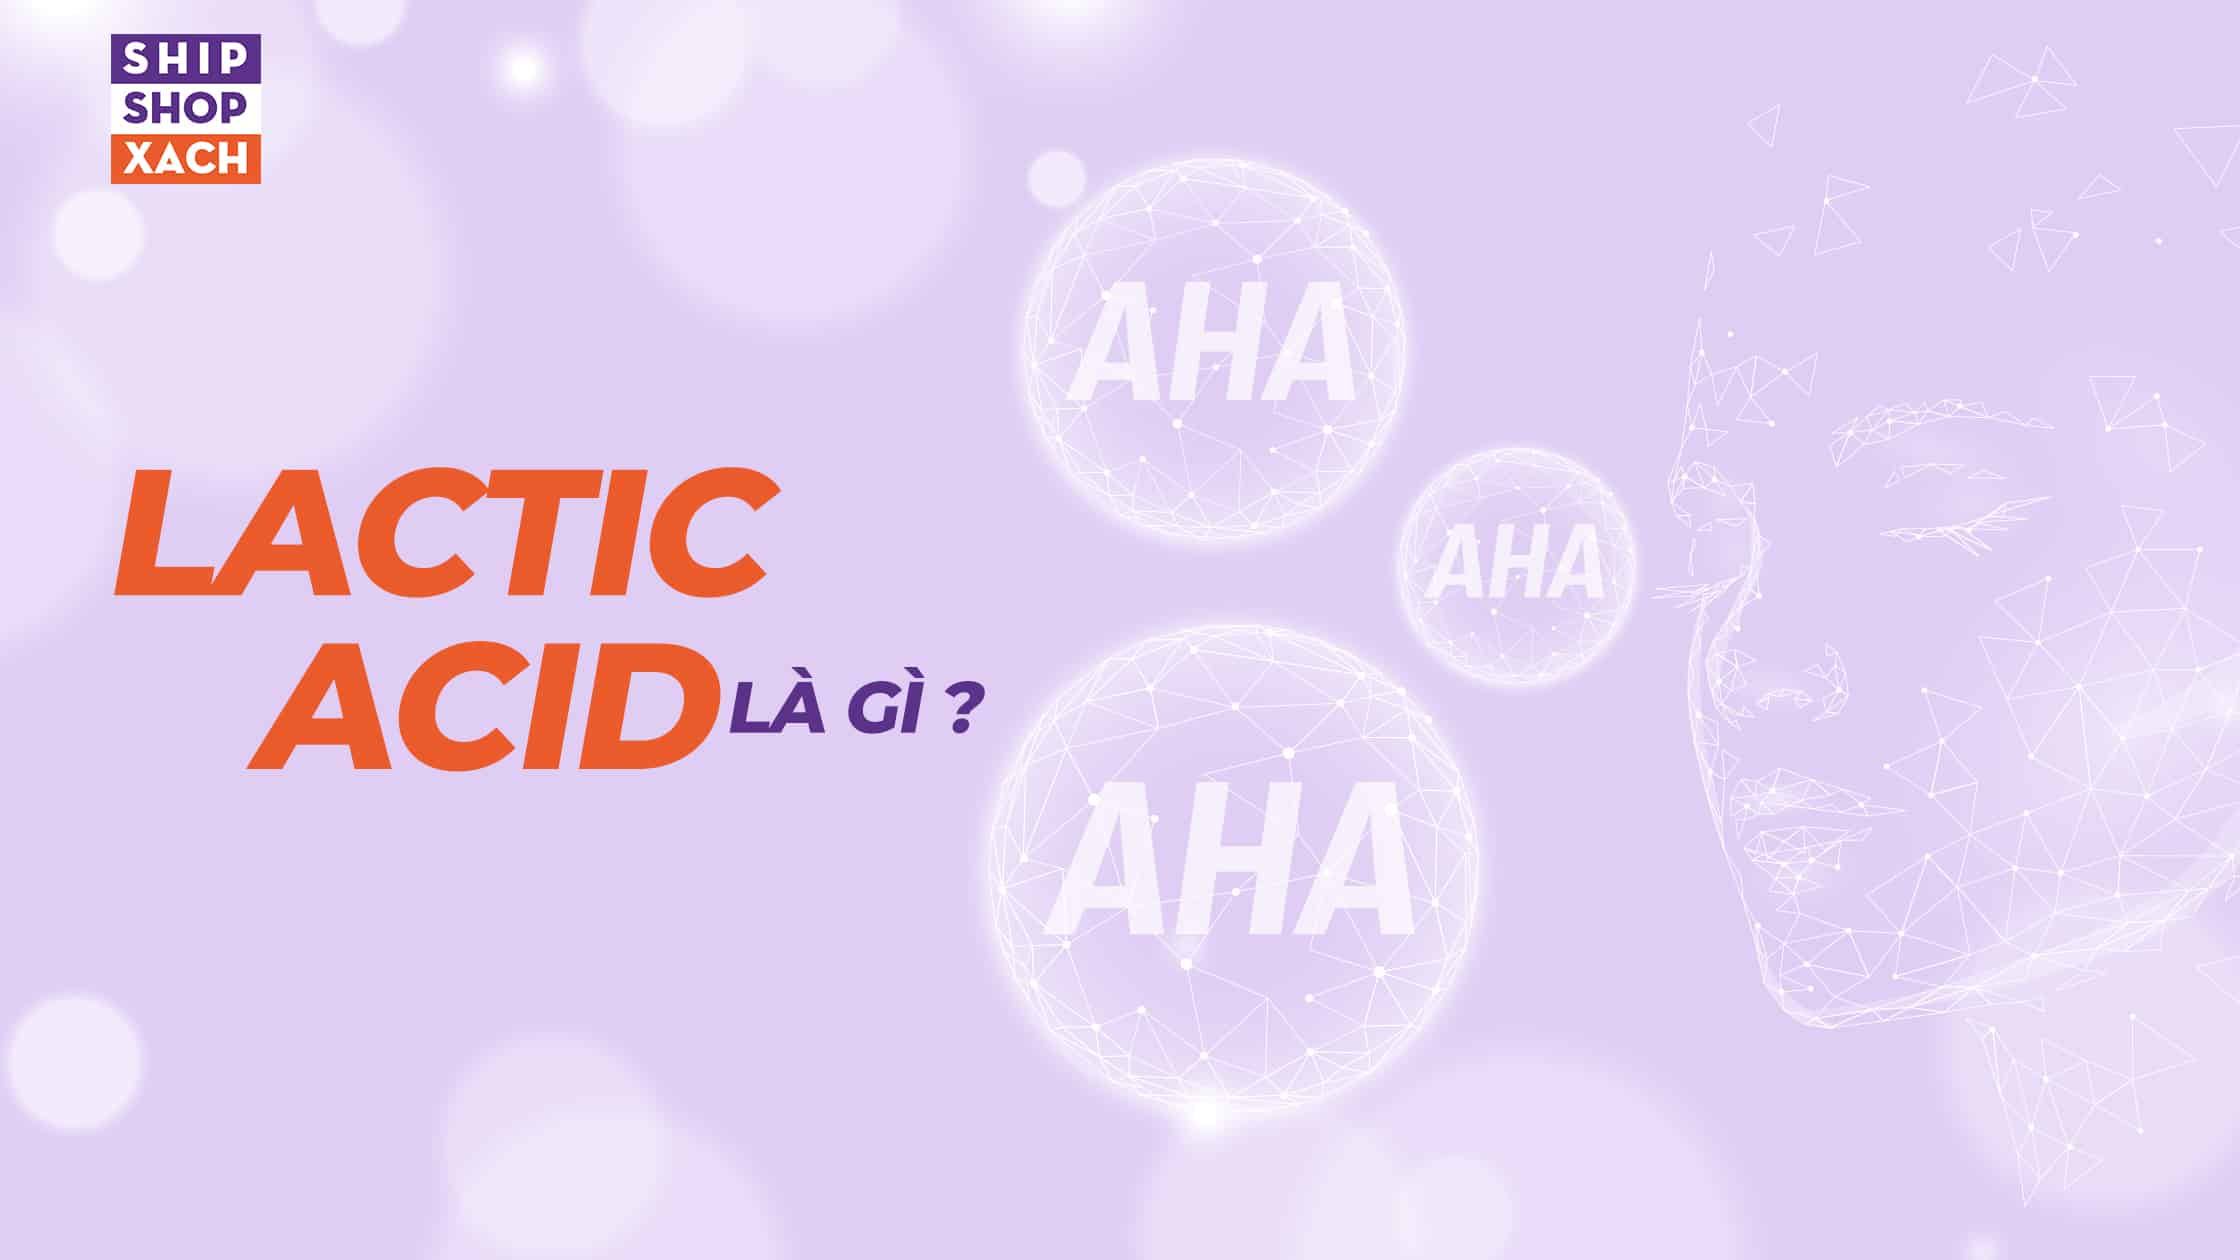 lactic acid la gi